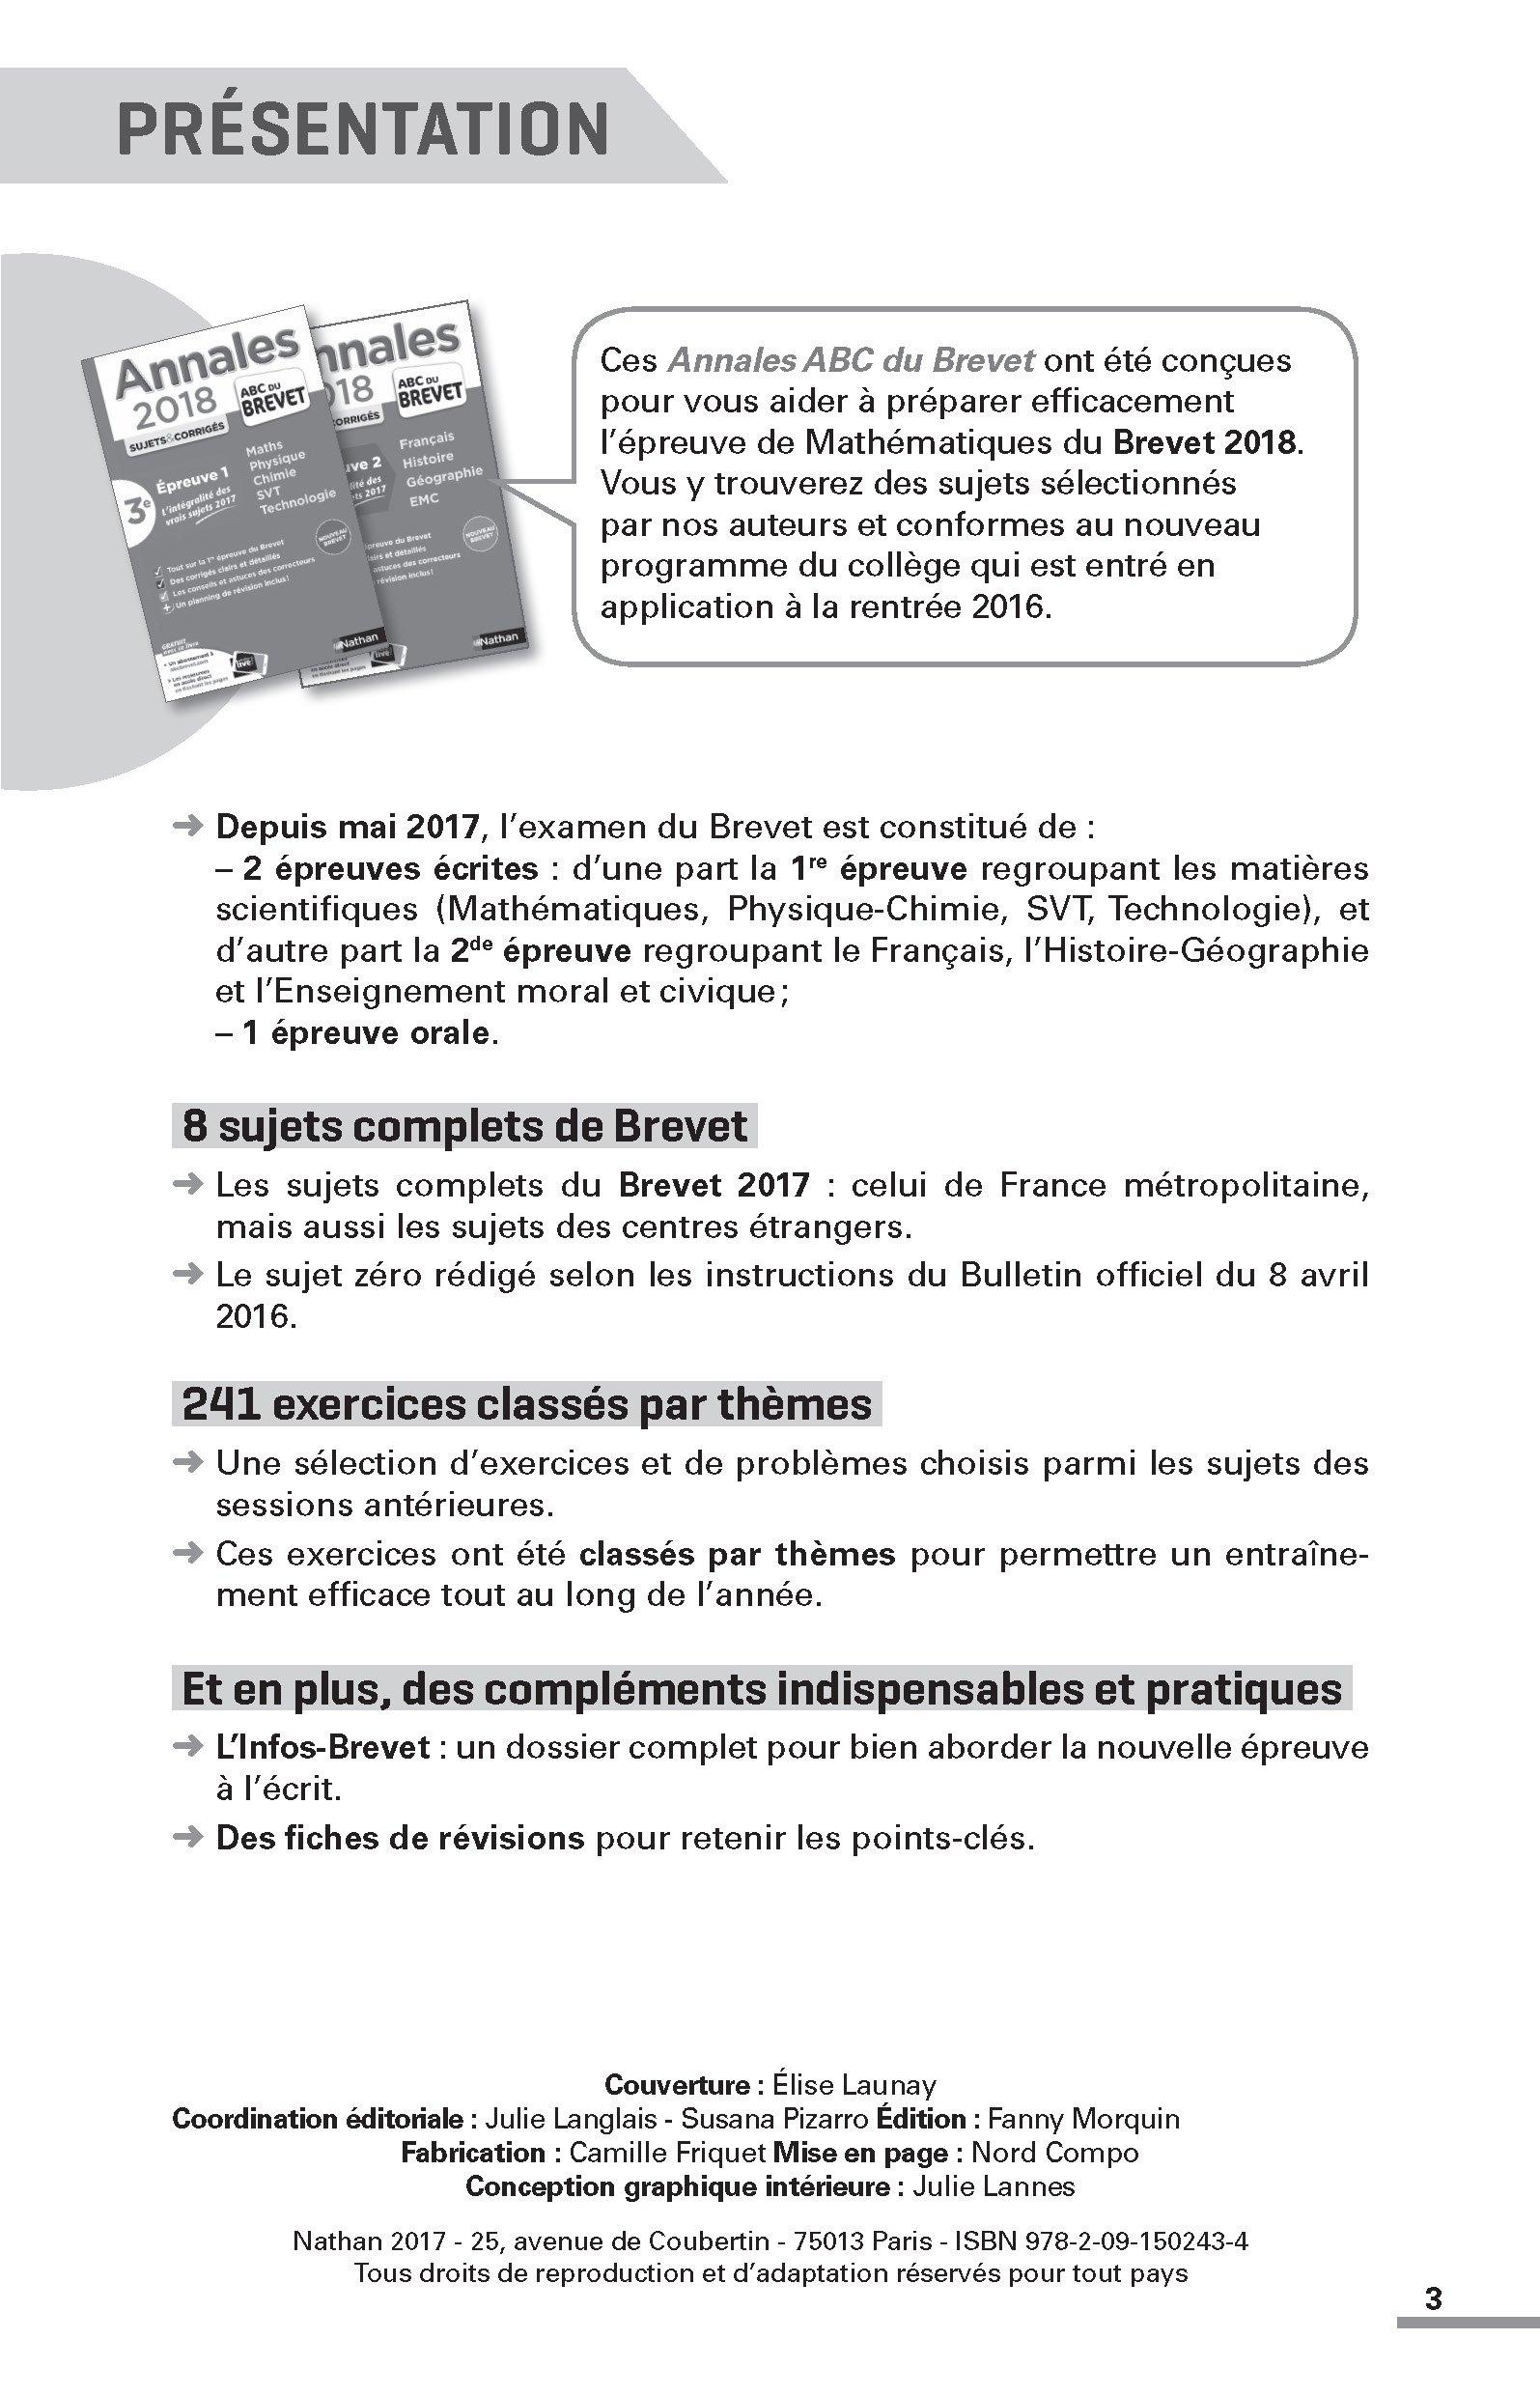 Maths 3e : Sujets (Annales ABC du Brevet): Amazon.es: Carole Feugère, Gilles Mora: Libros en idiomas extranjeros